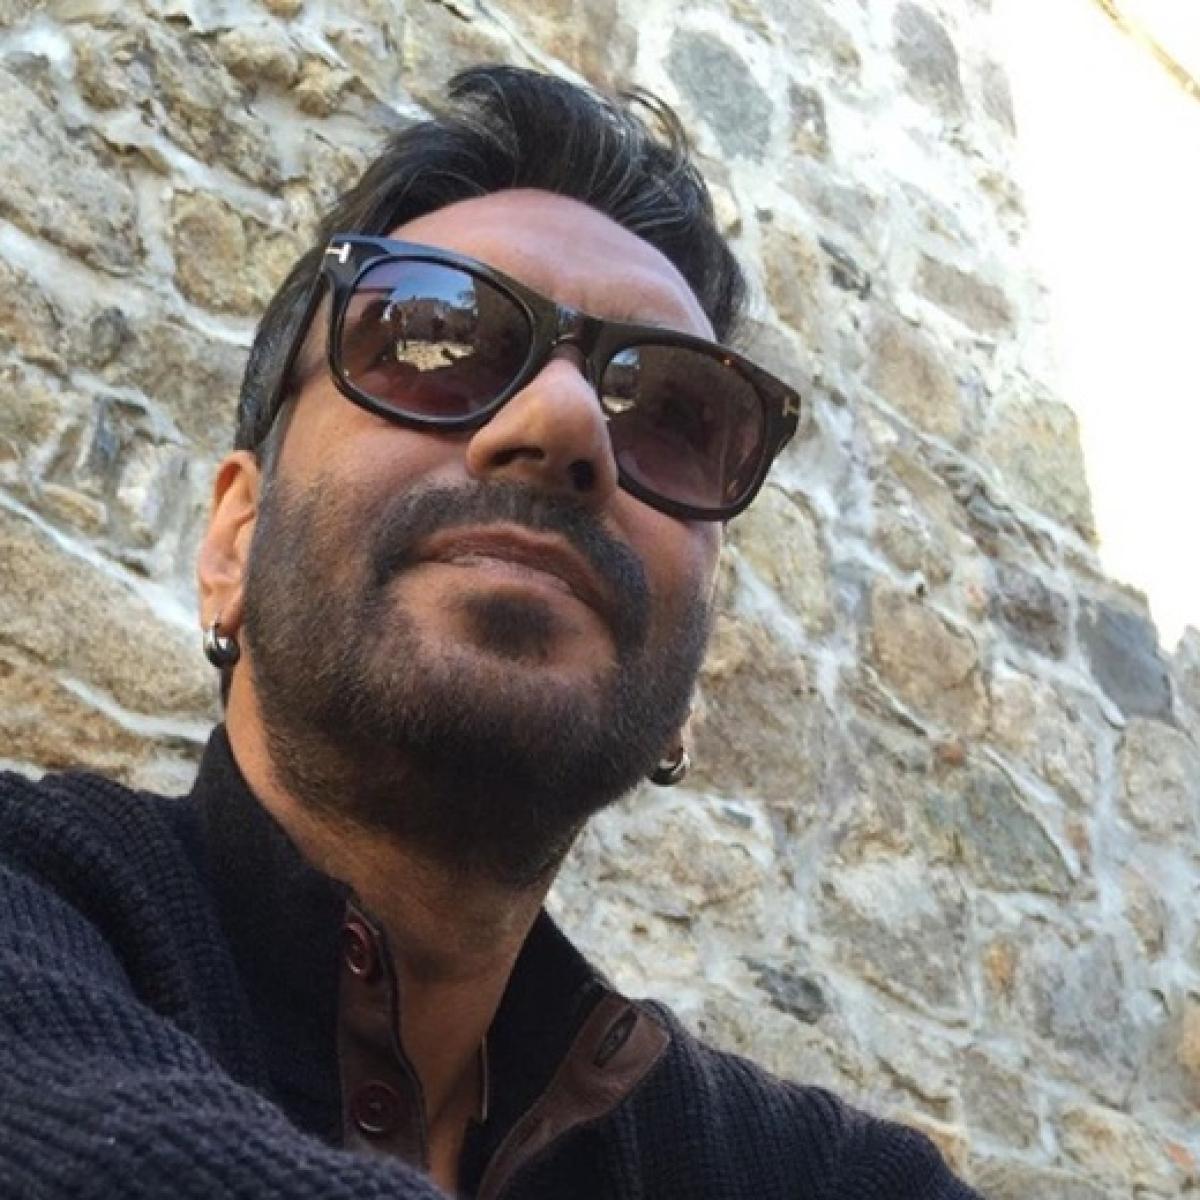 Ajay Devgn to chose between Sanjay Leela Bhansali and Aanand L Rai?